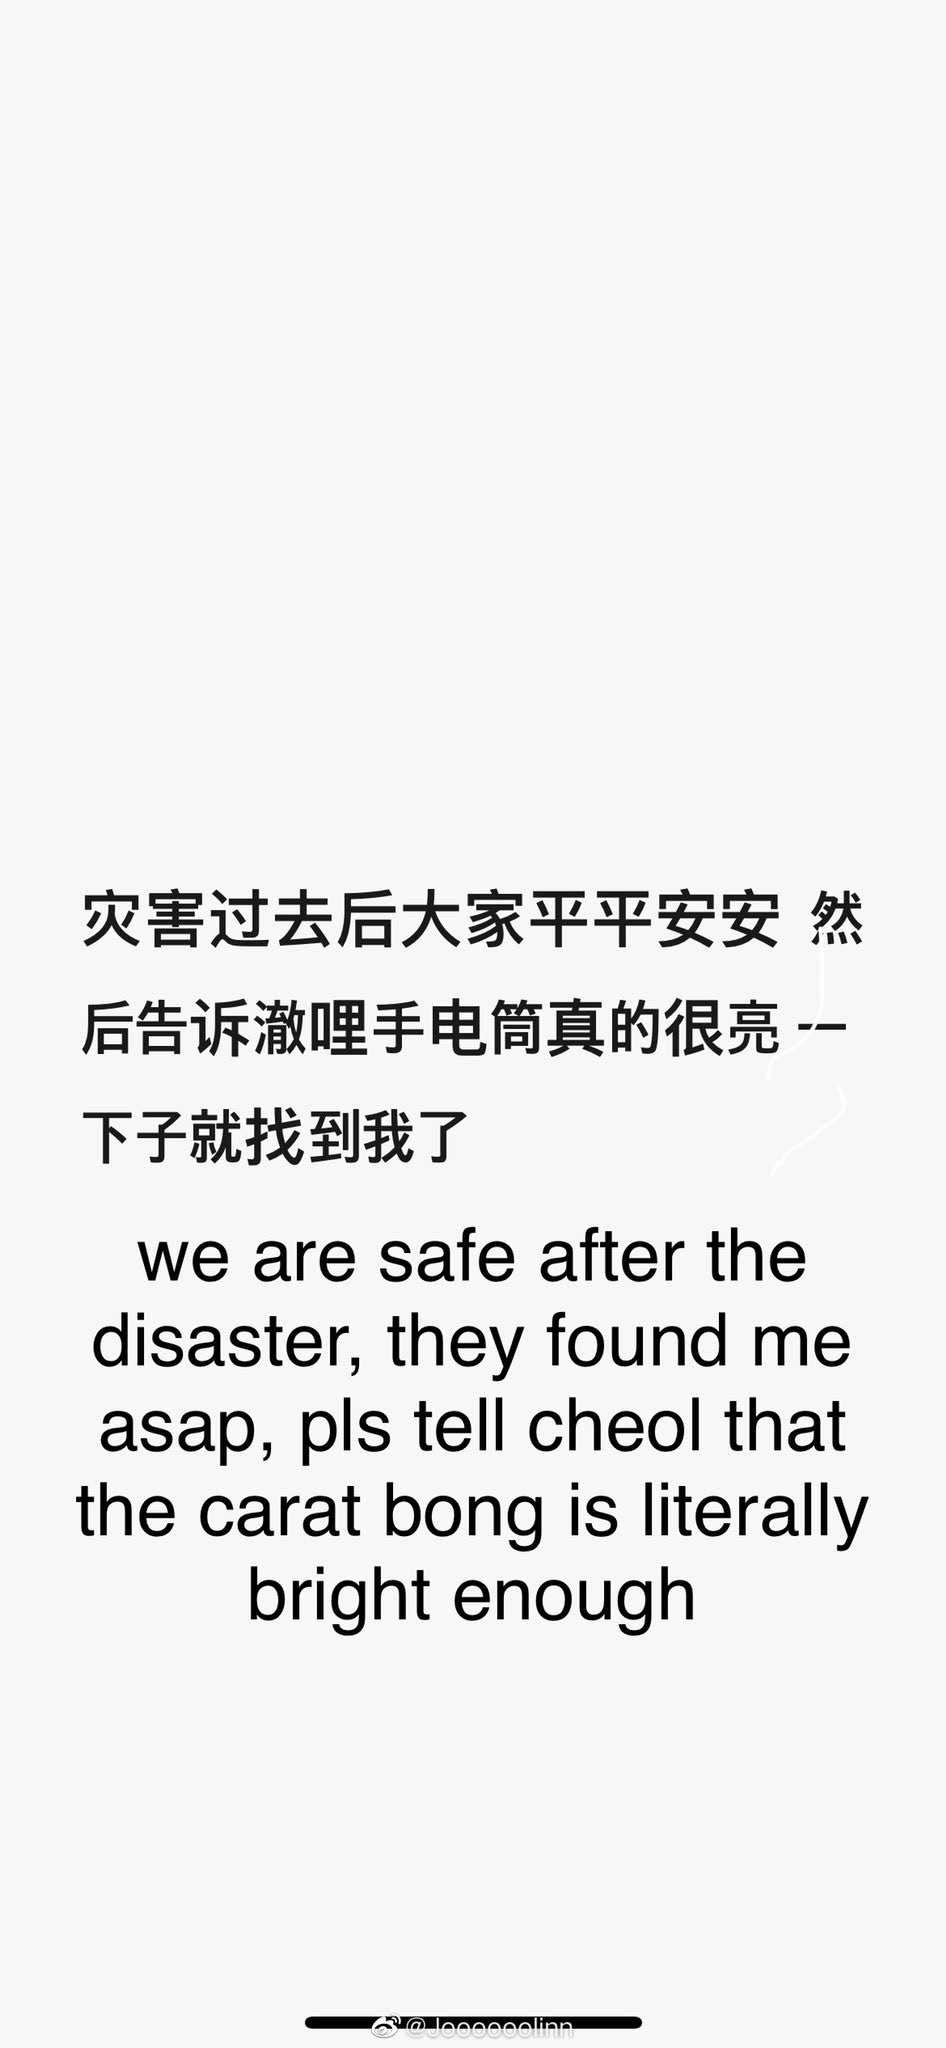 seventeen-lightstick-rescue-weibopost-2021